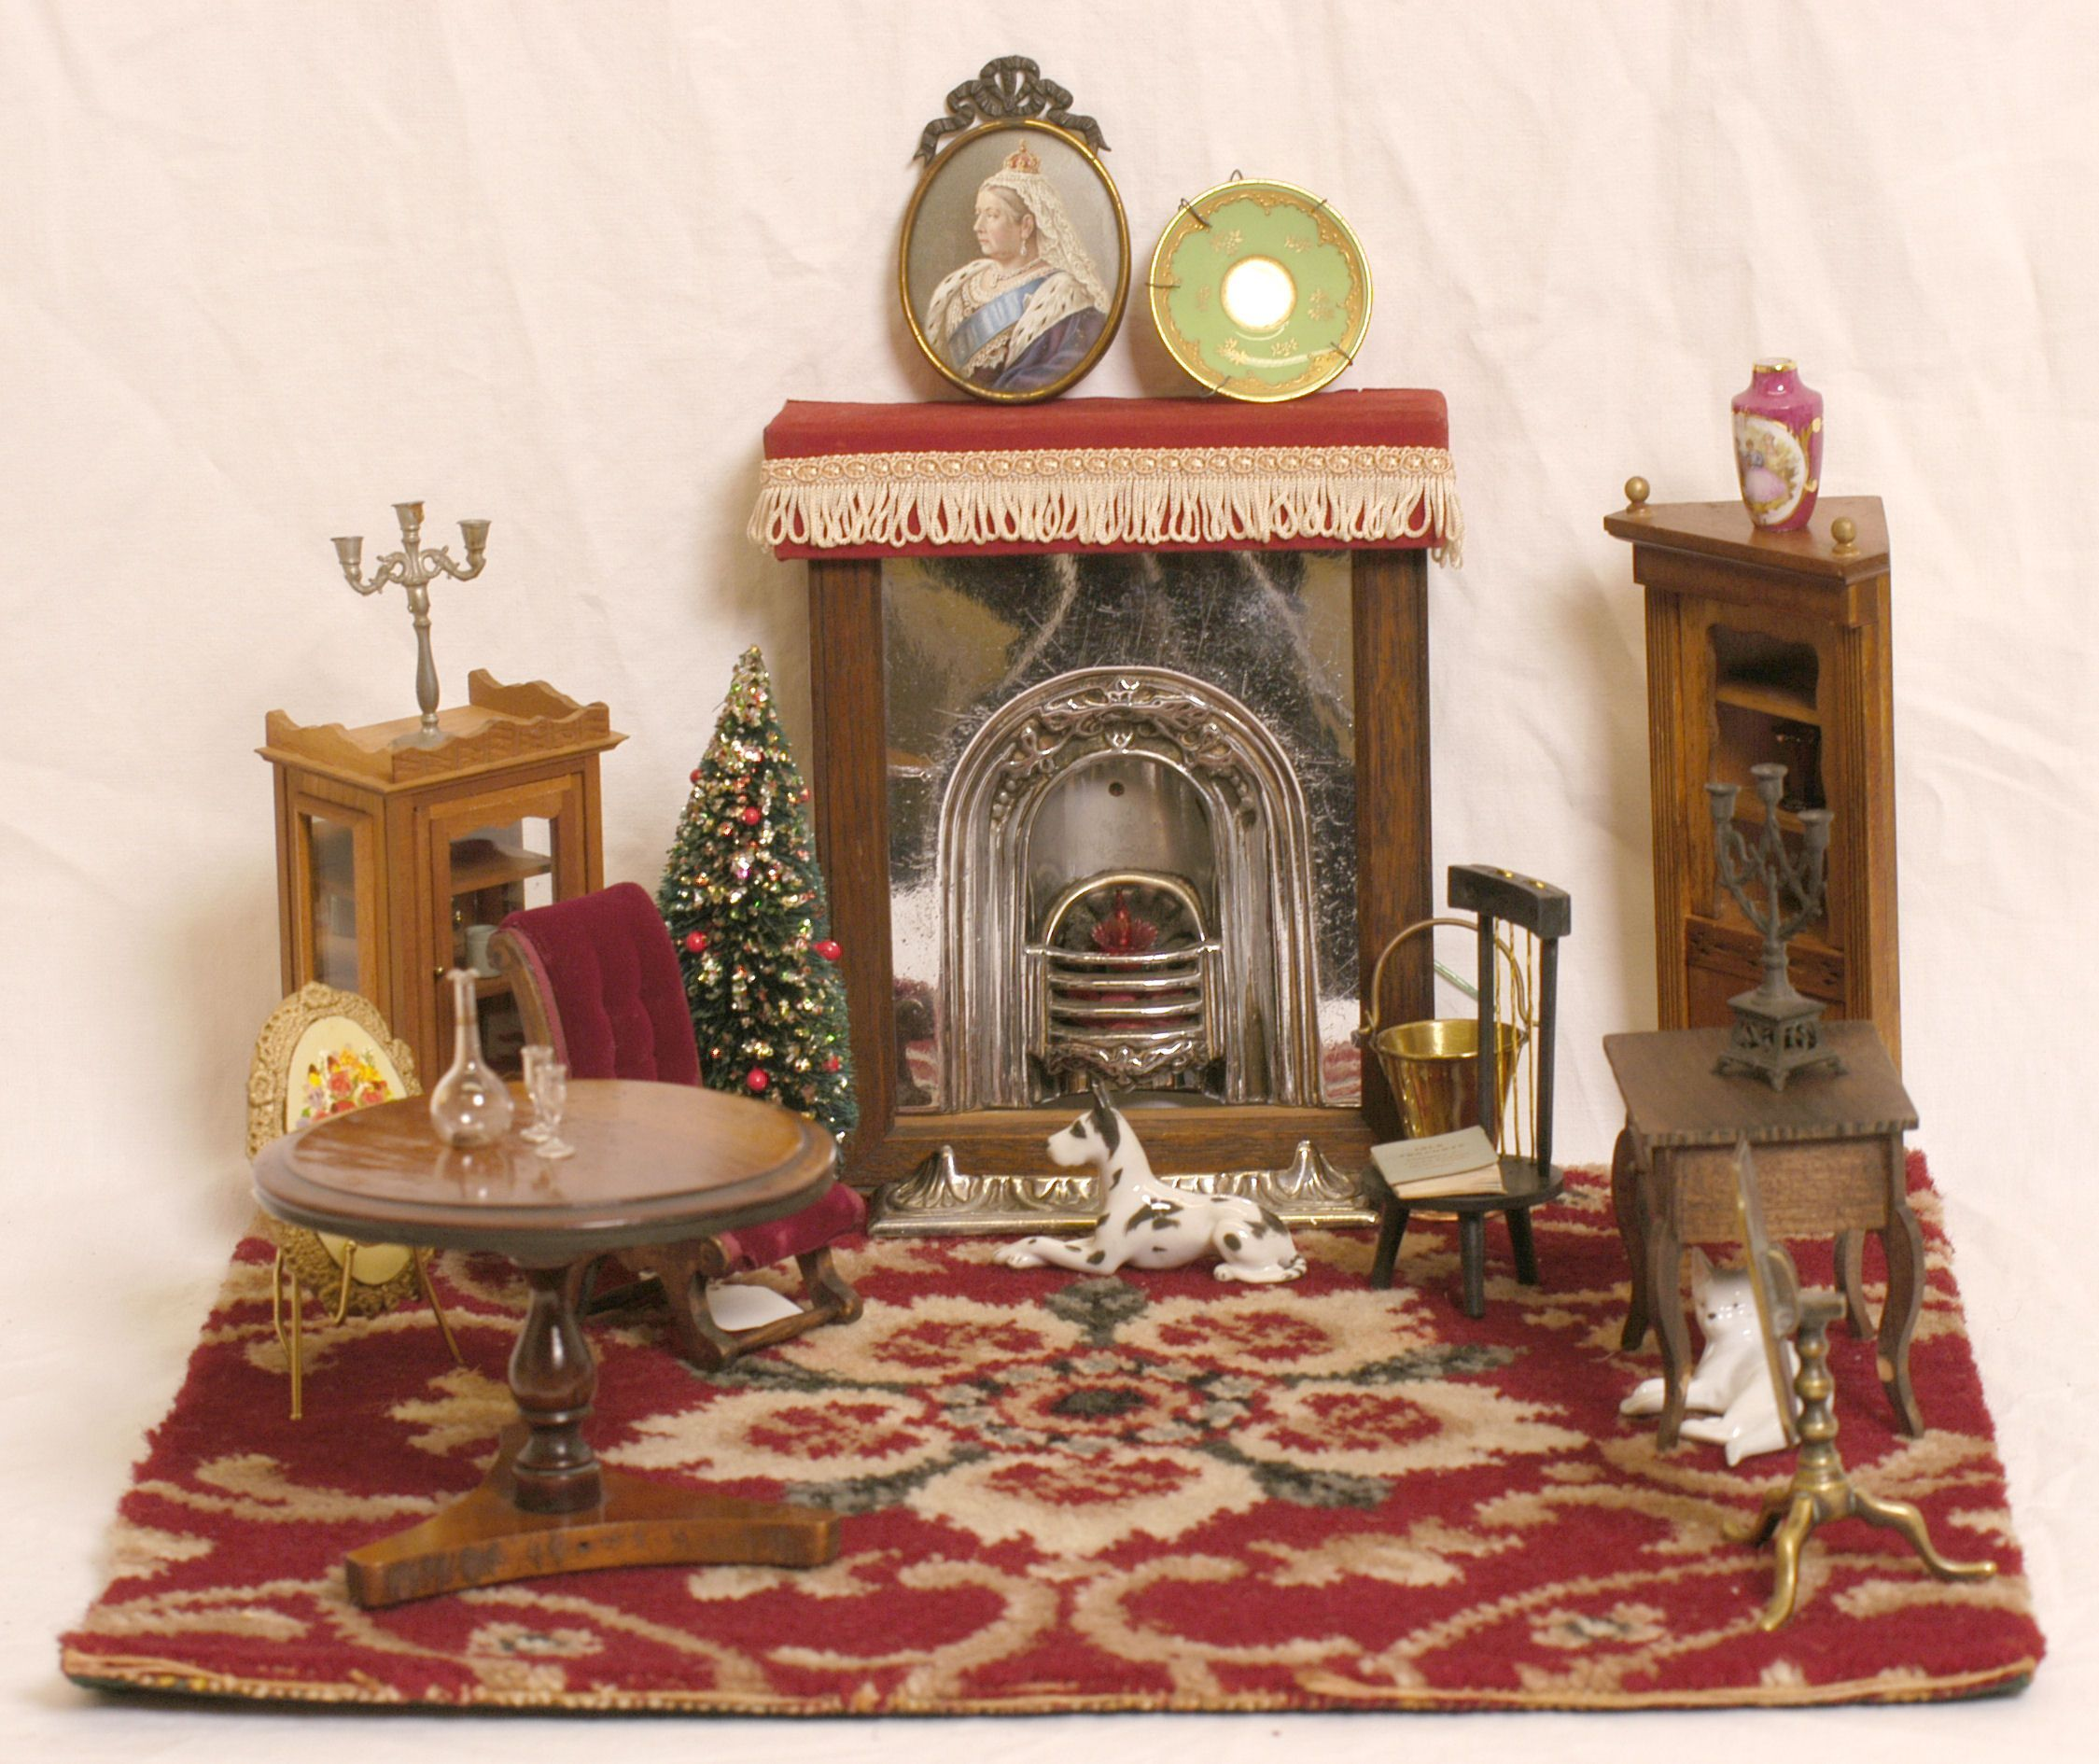 Delightful Victorian Dollu0027s House Furniture Victorian Homes Uttlesford.gov.uk